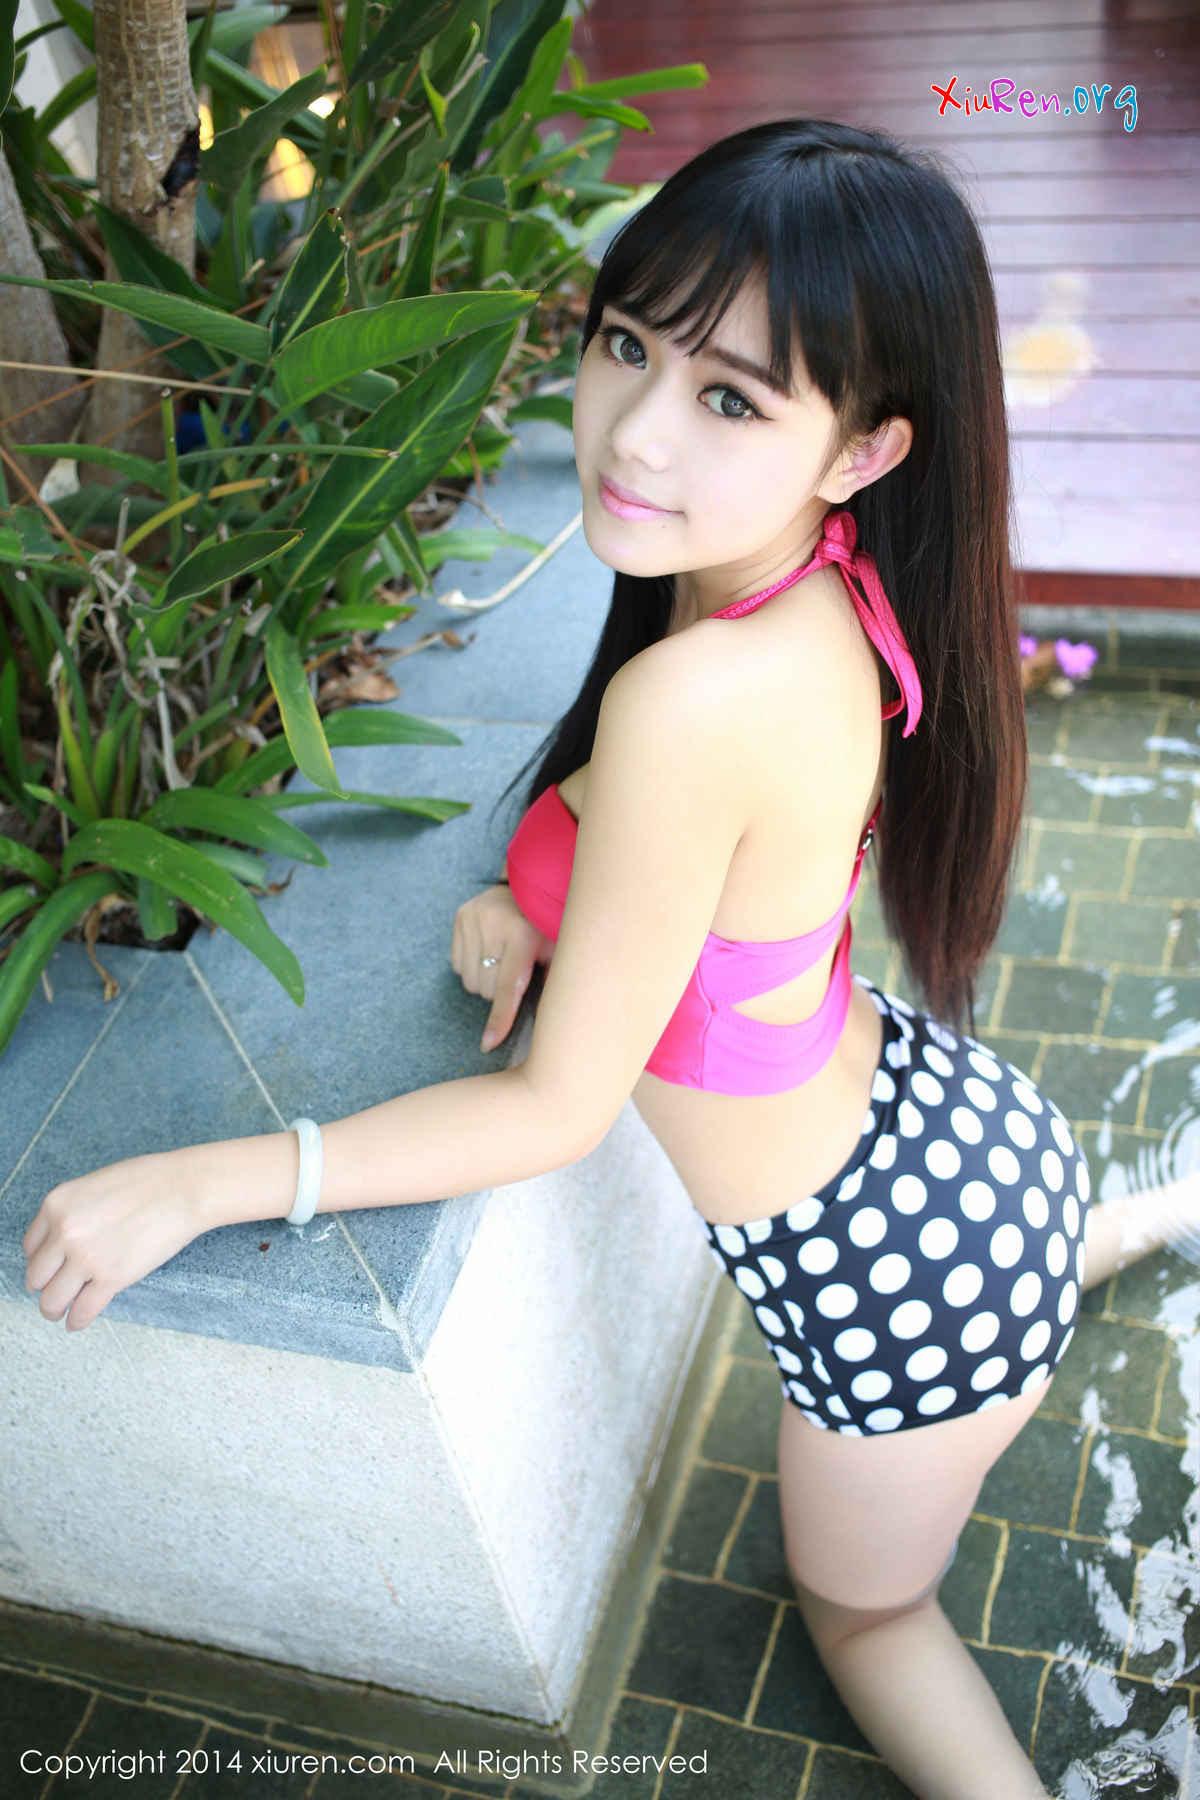 PhimVu-Blog-0040.jpg